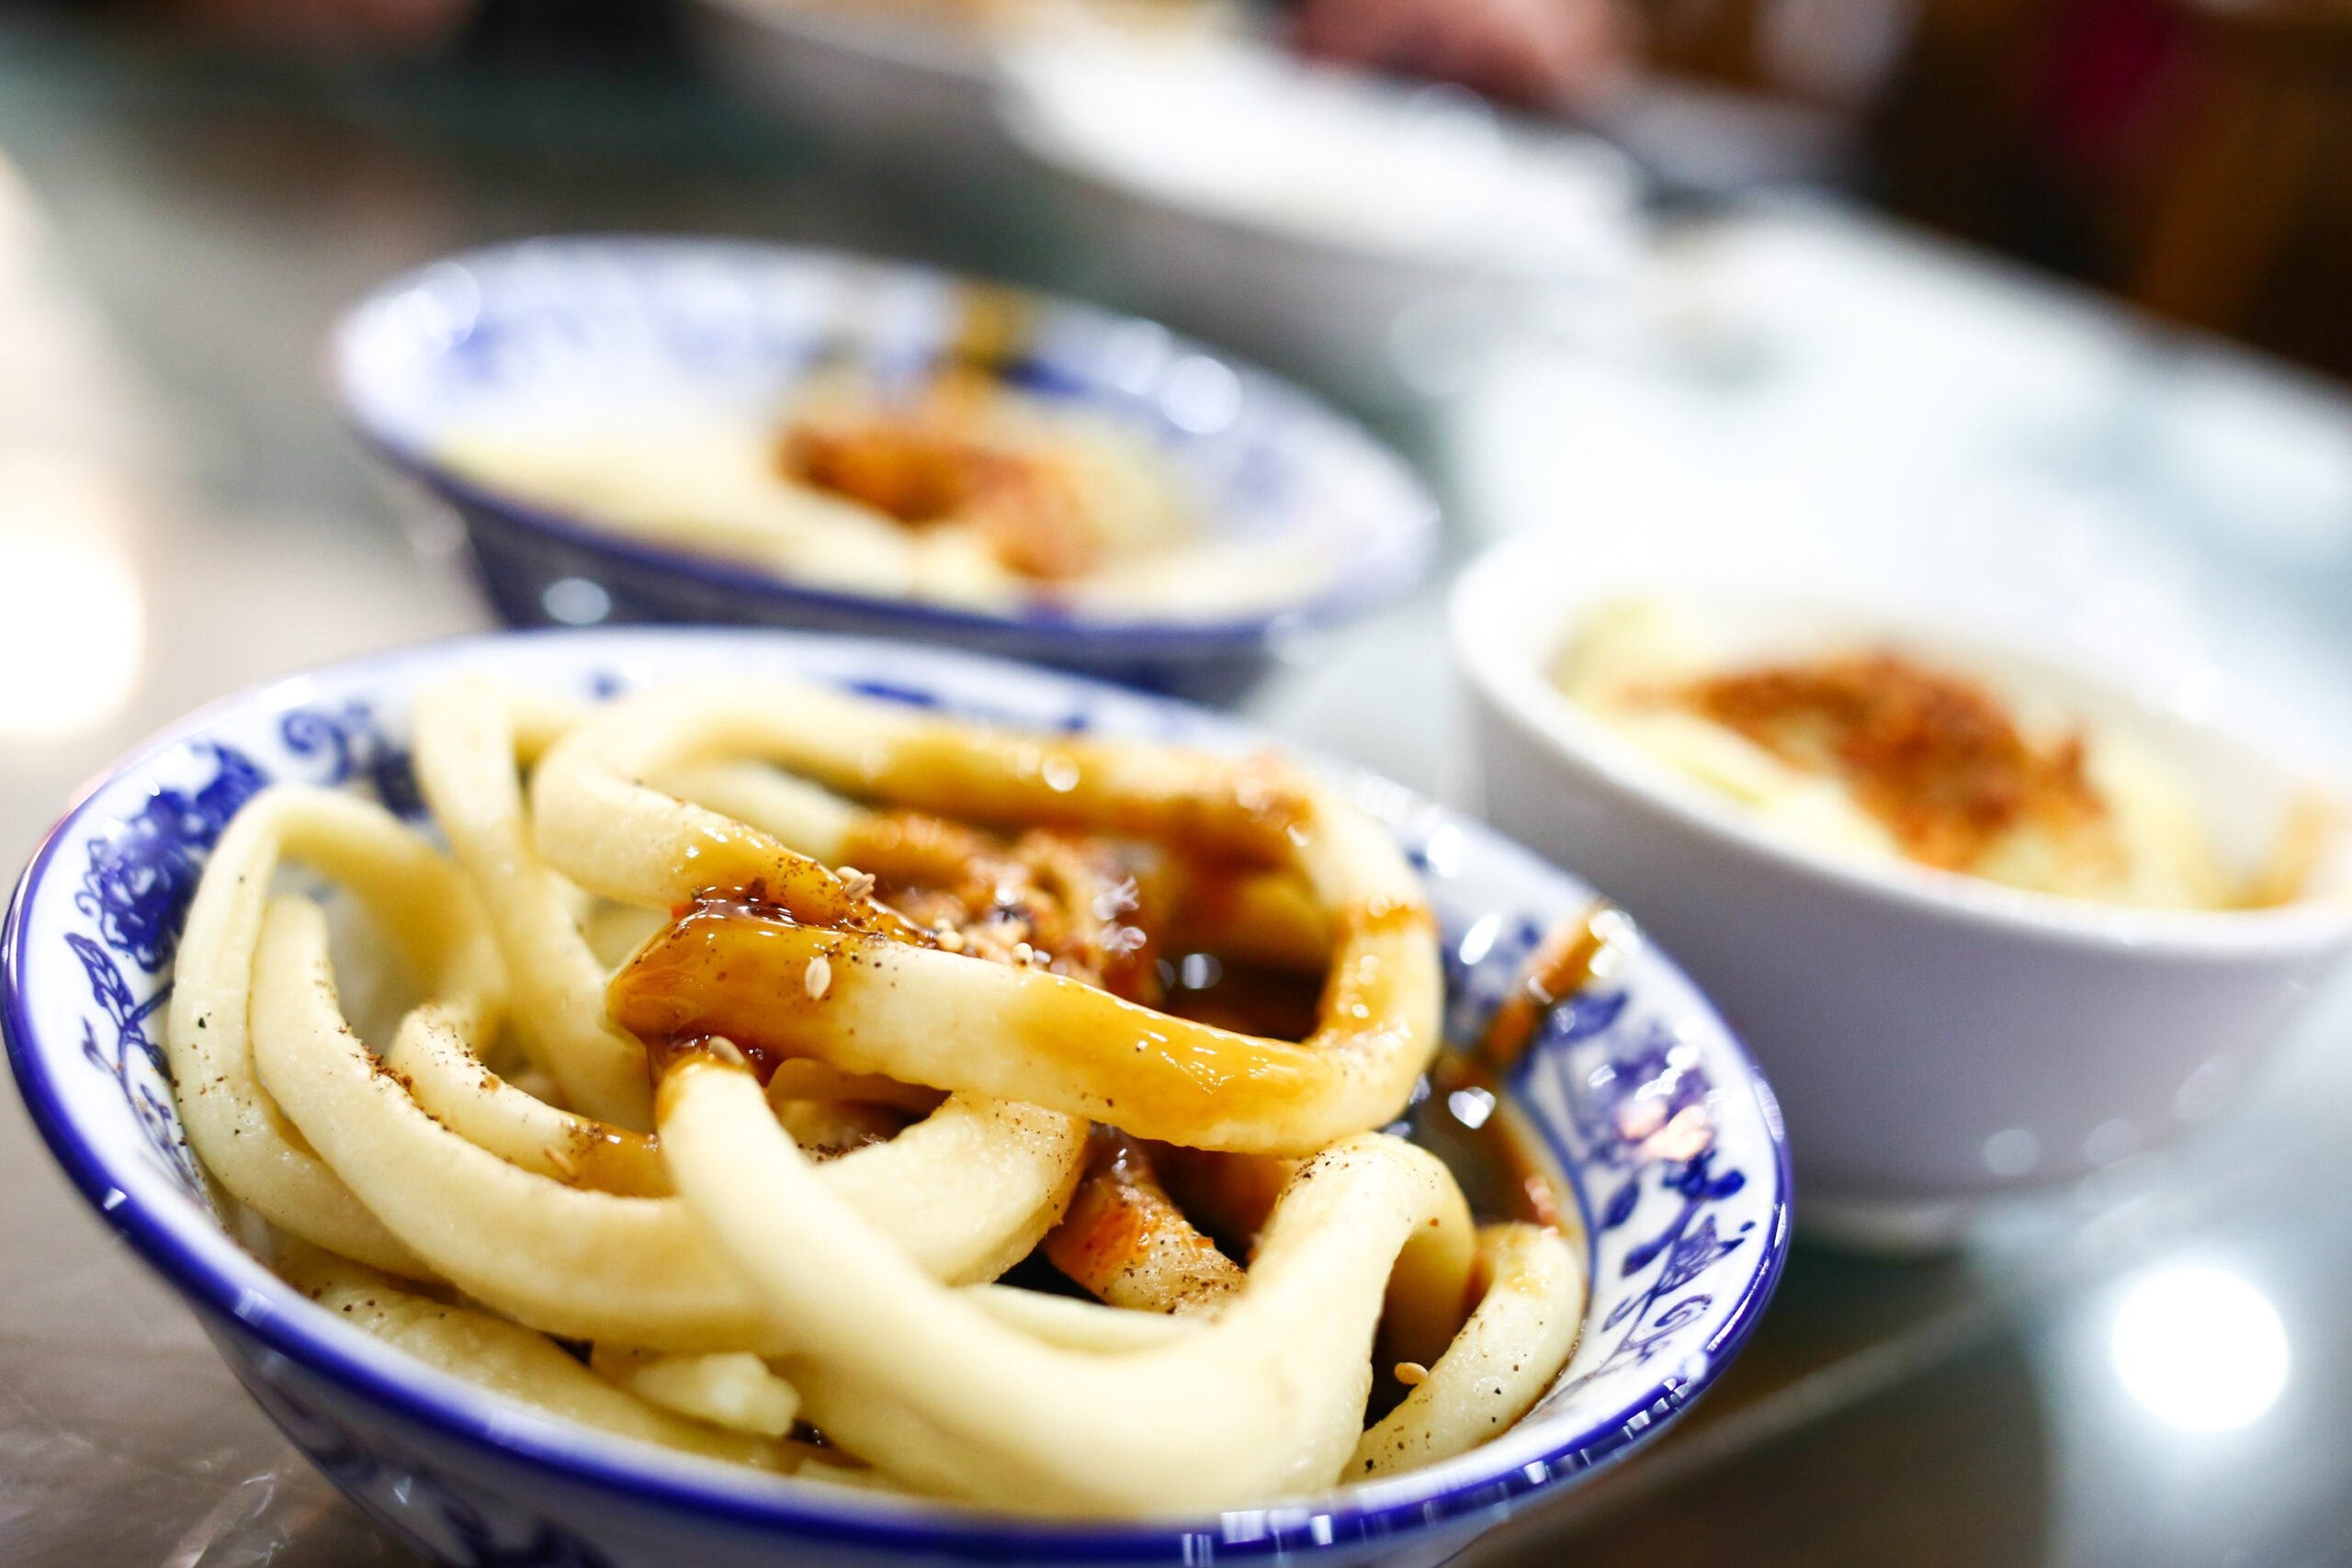 Taste Local Tianshui Noodles During Our Chengdu Evening Food Tour